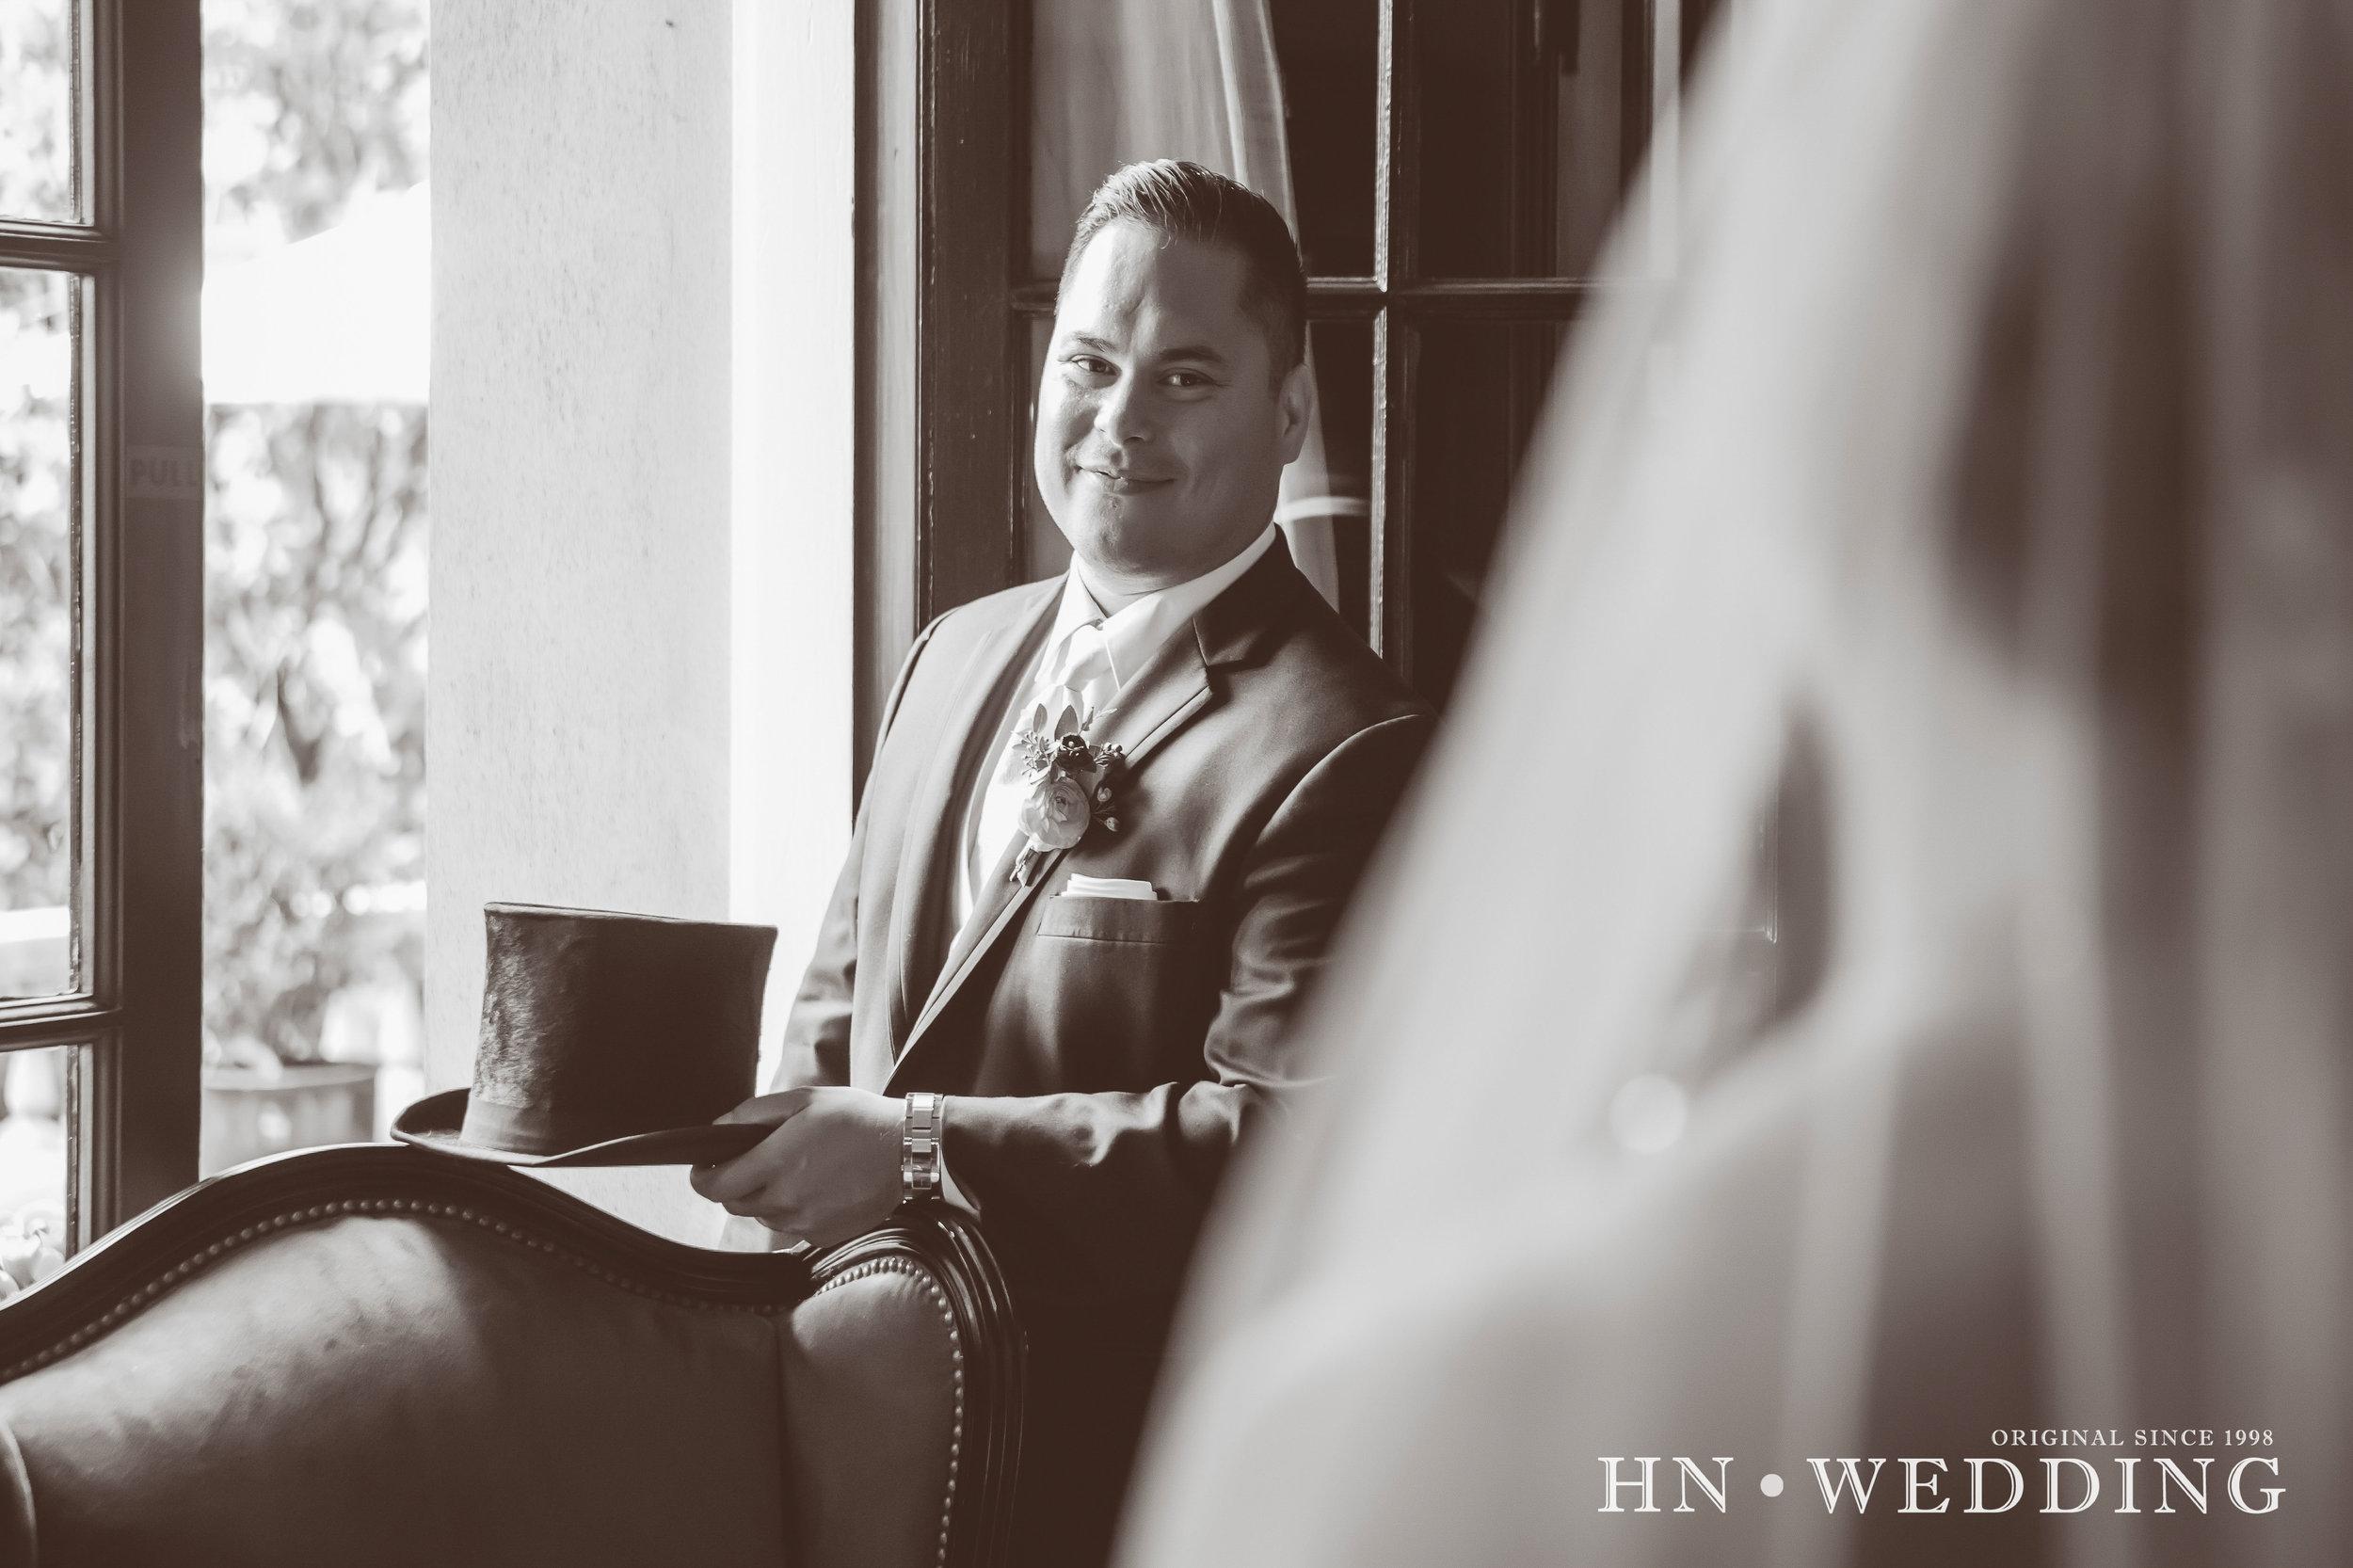 hnwedding20170806weddingday-43.jpg